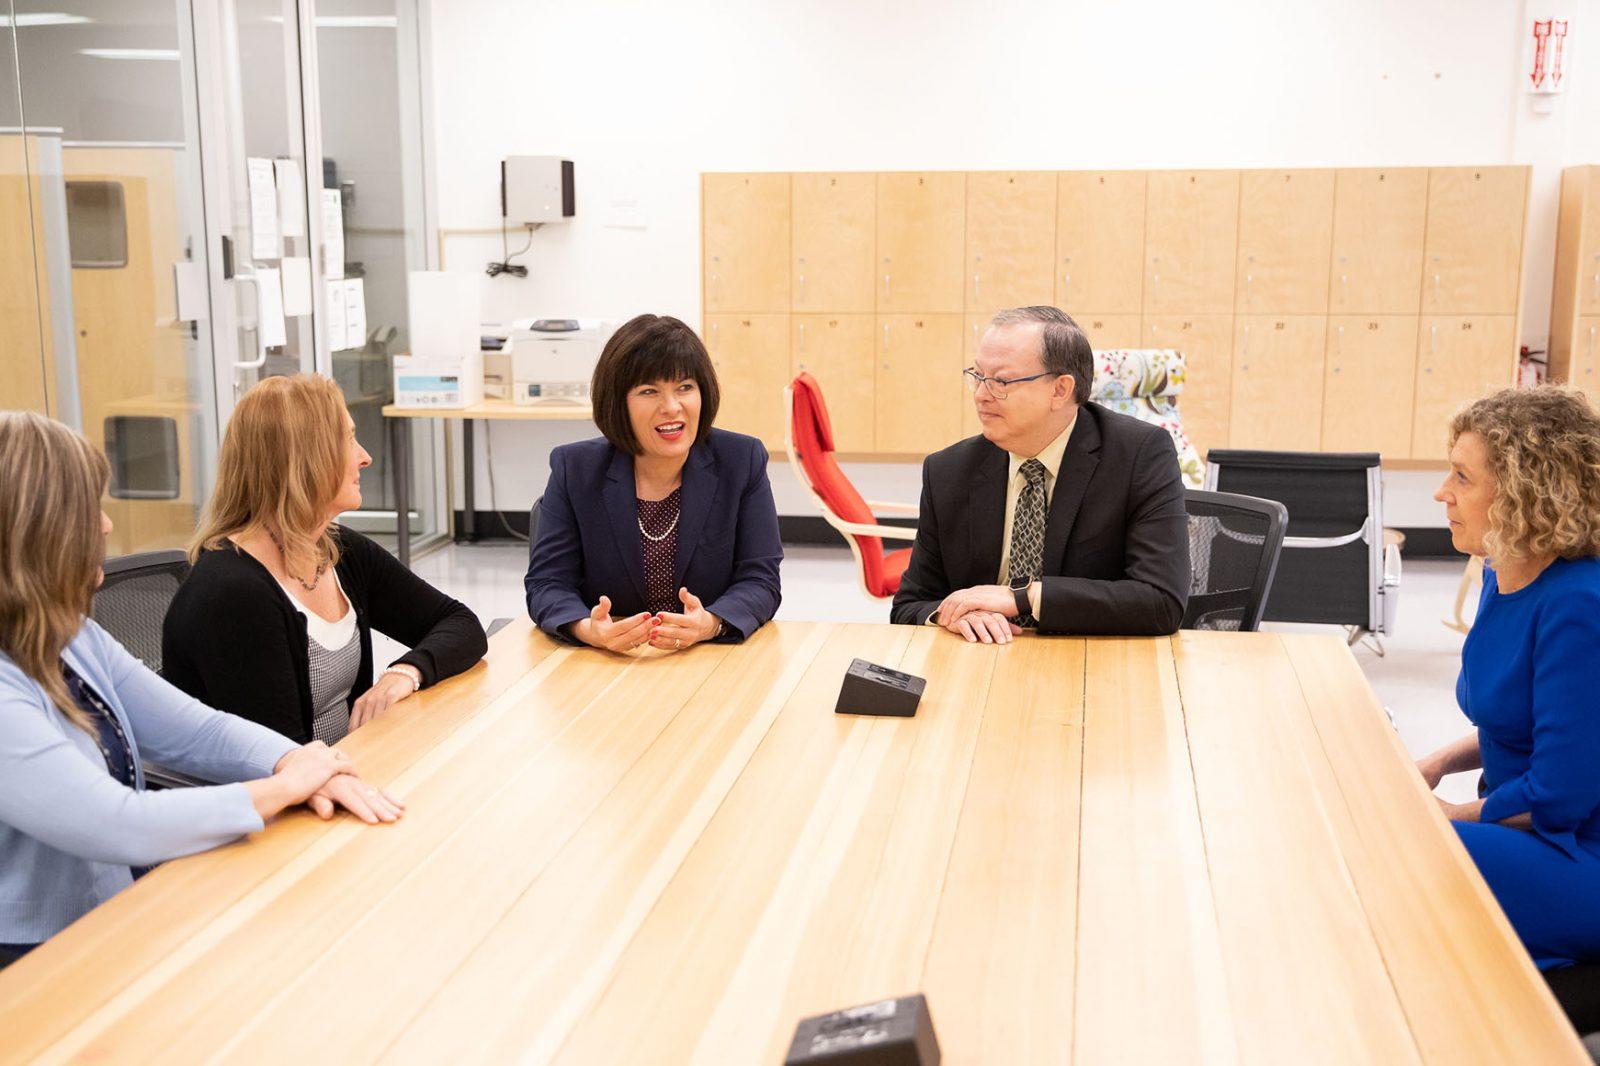 Health minister visit